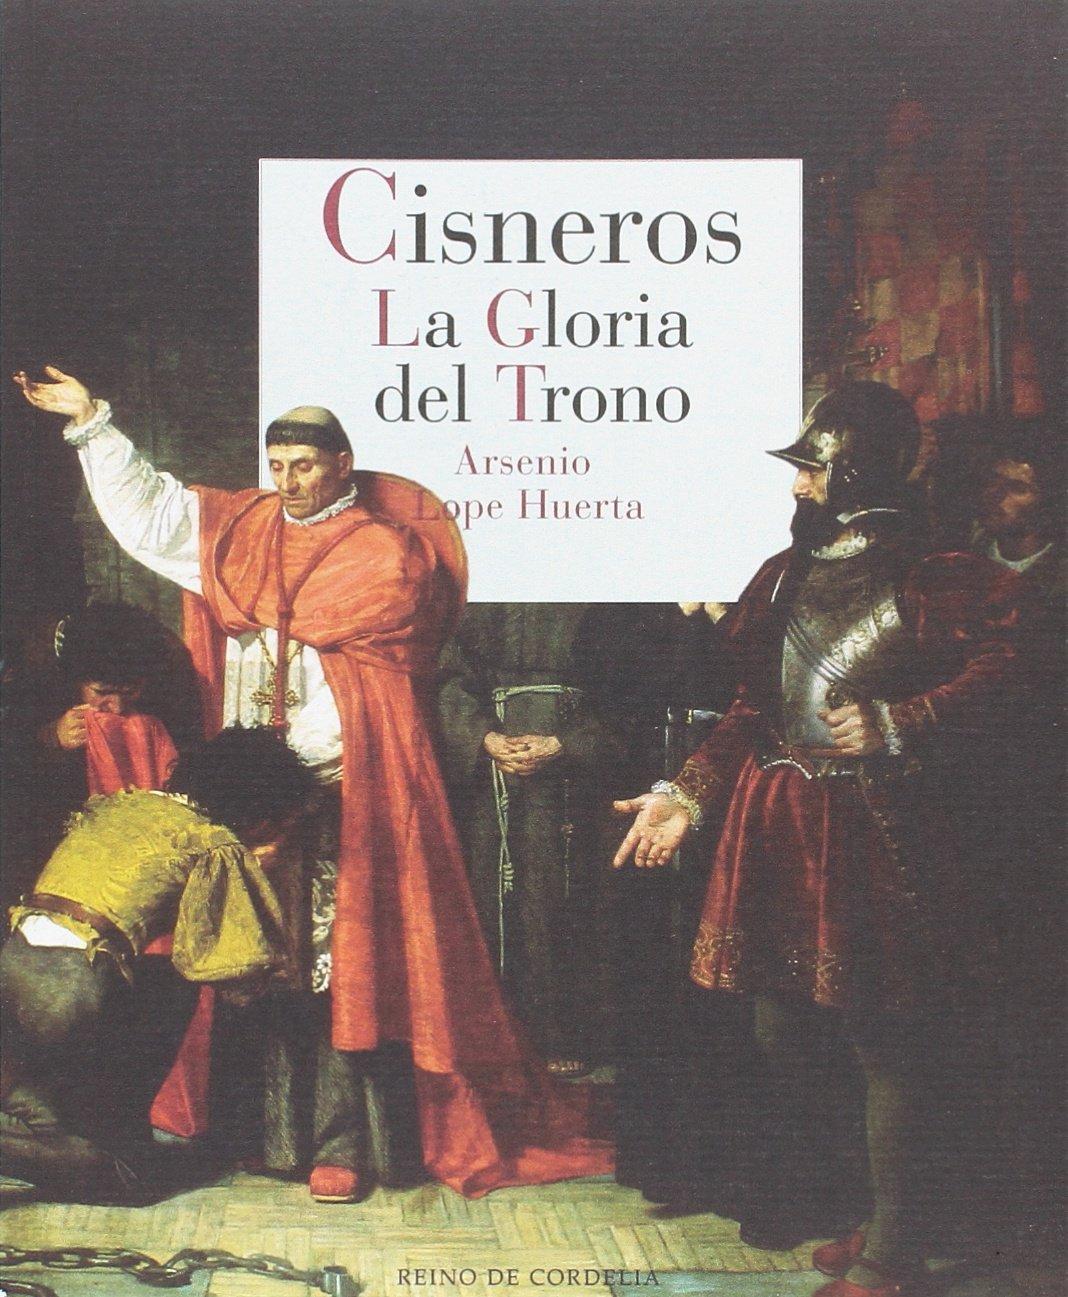 Cisneros. La gloria del trono (Reino de Cordelia): Amazon.es: Lope Huerta, Arsenio: Libros